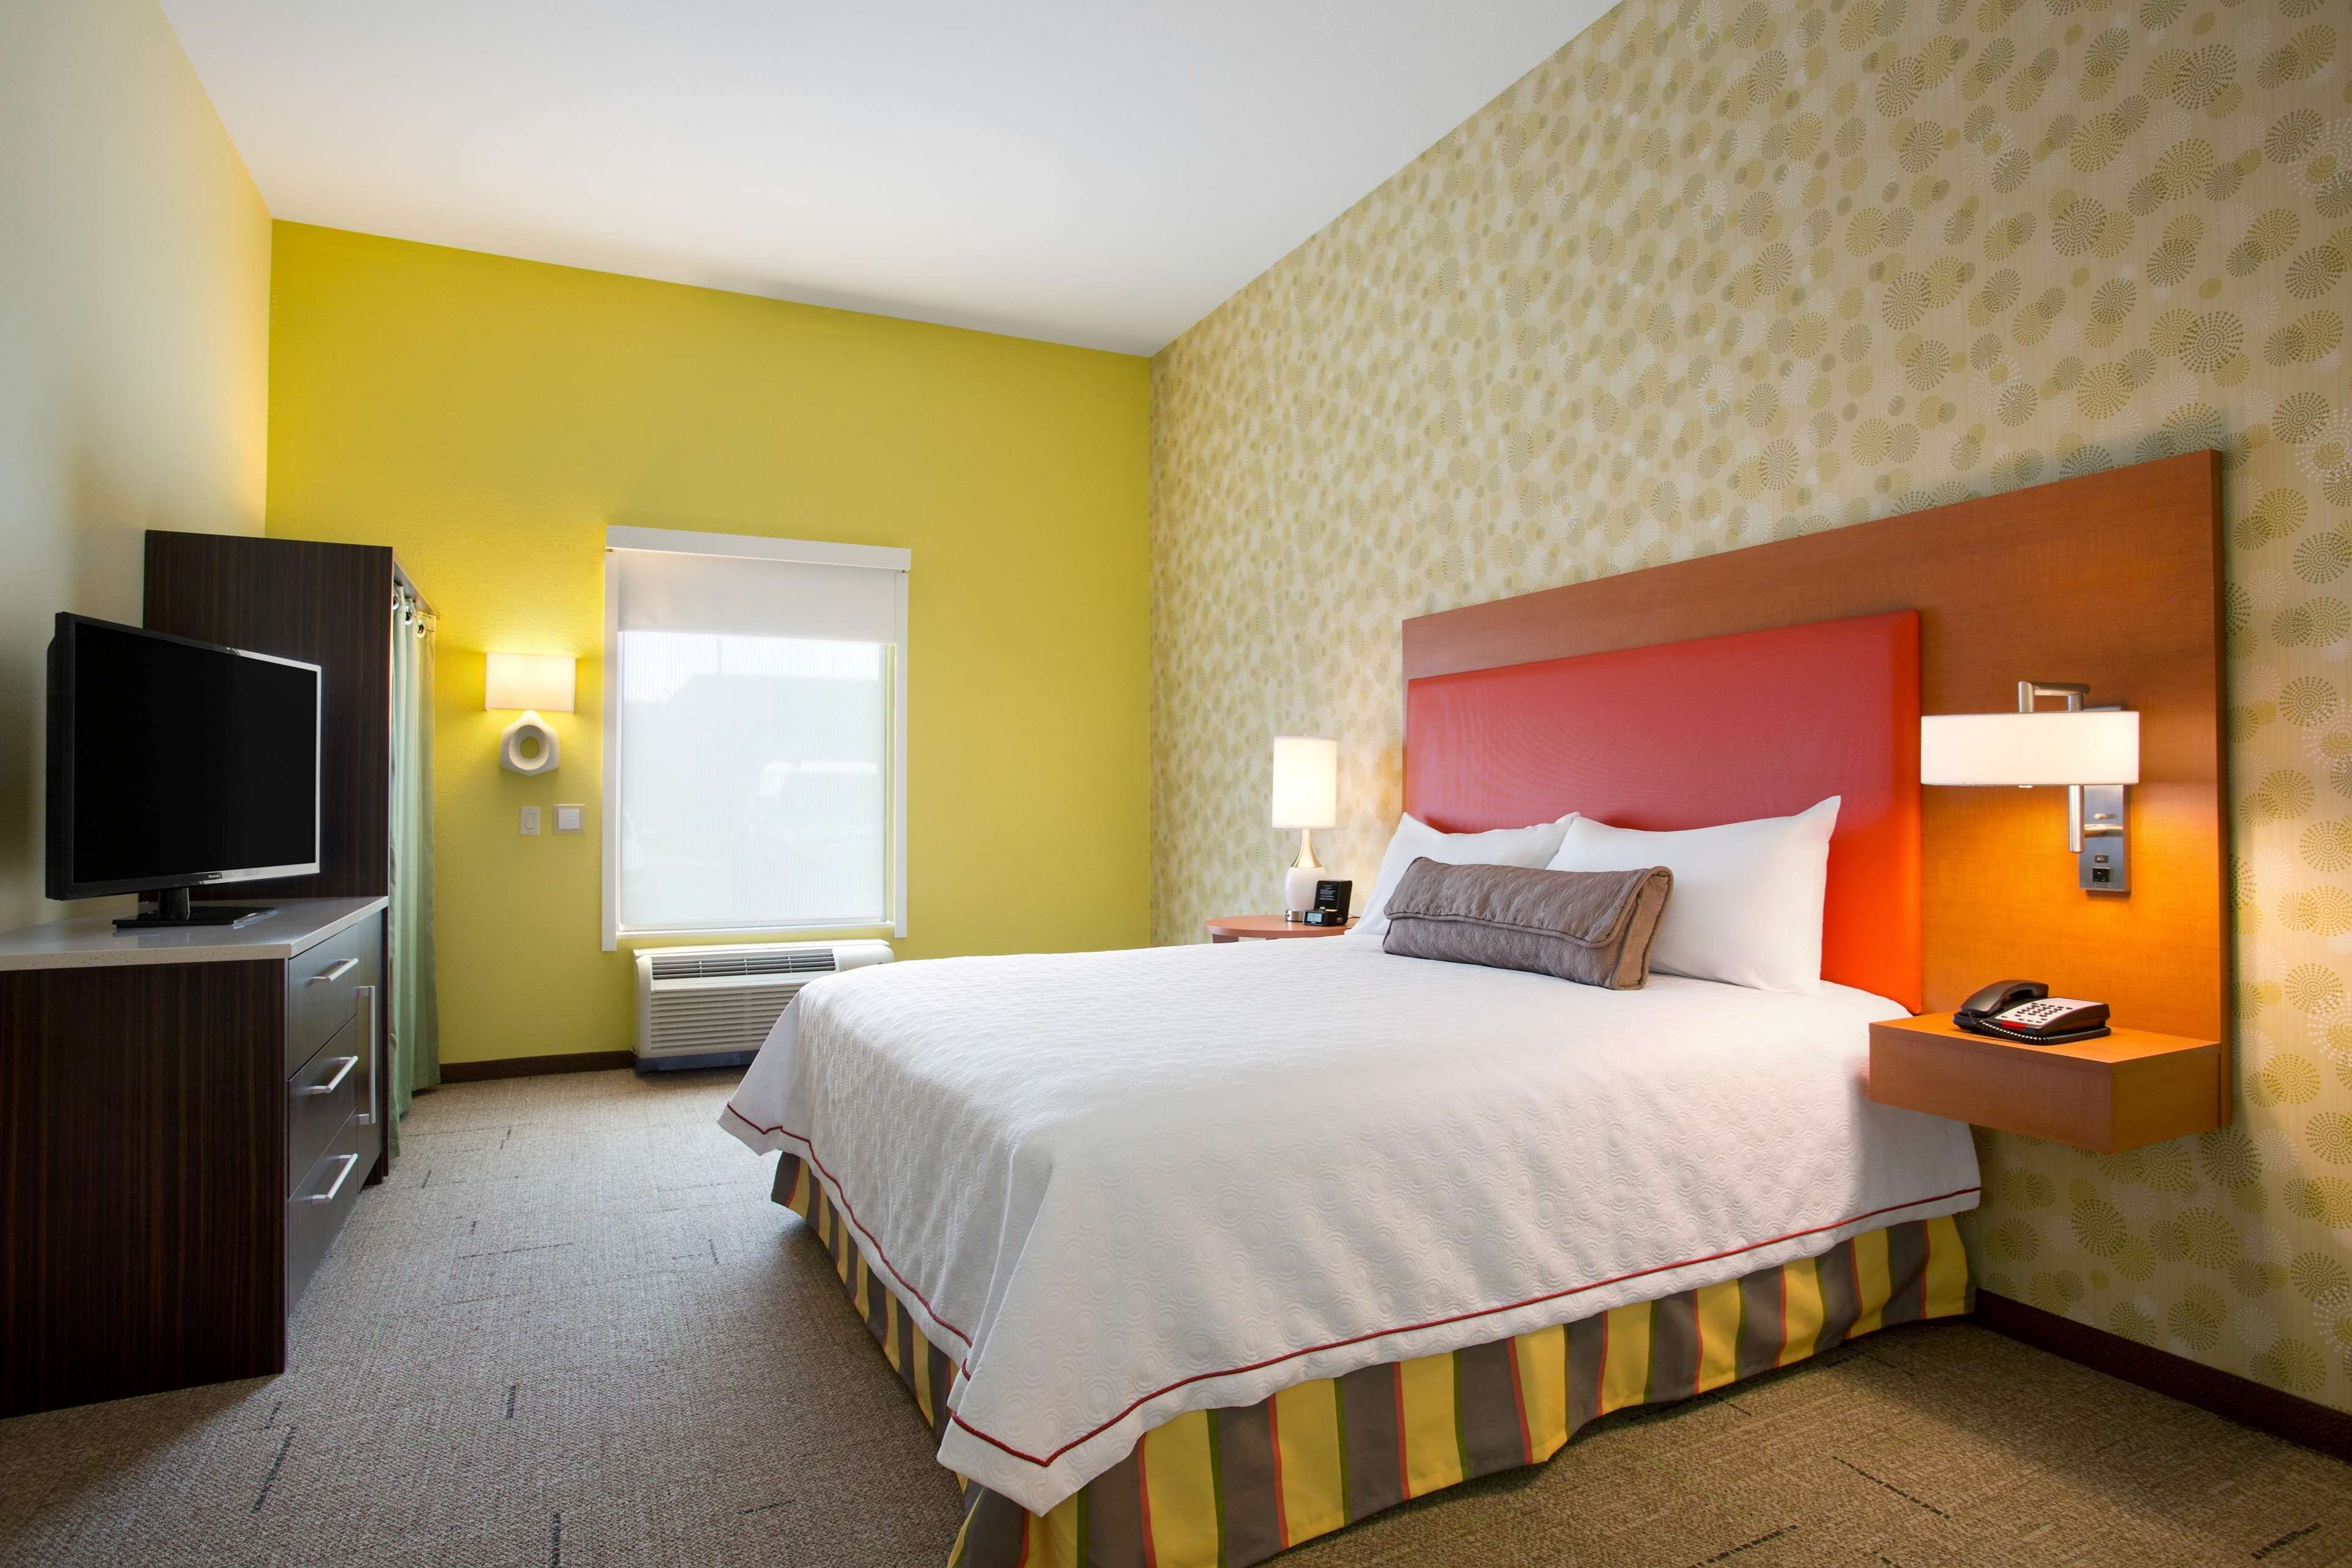 Home2 Suites by Hilton San Antonio Airport, TX image 23